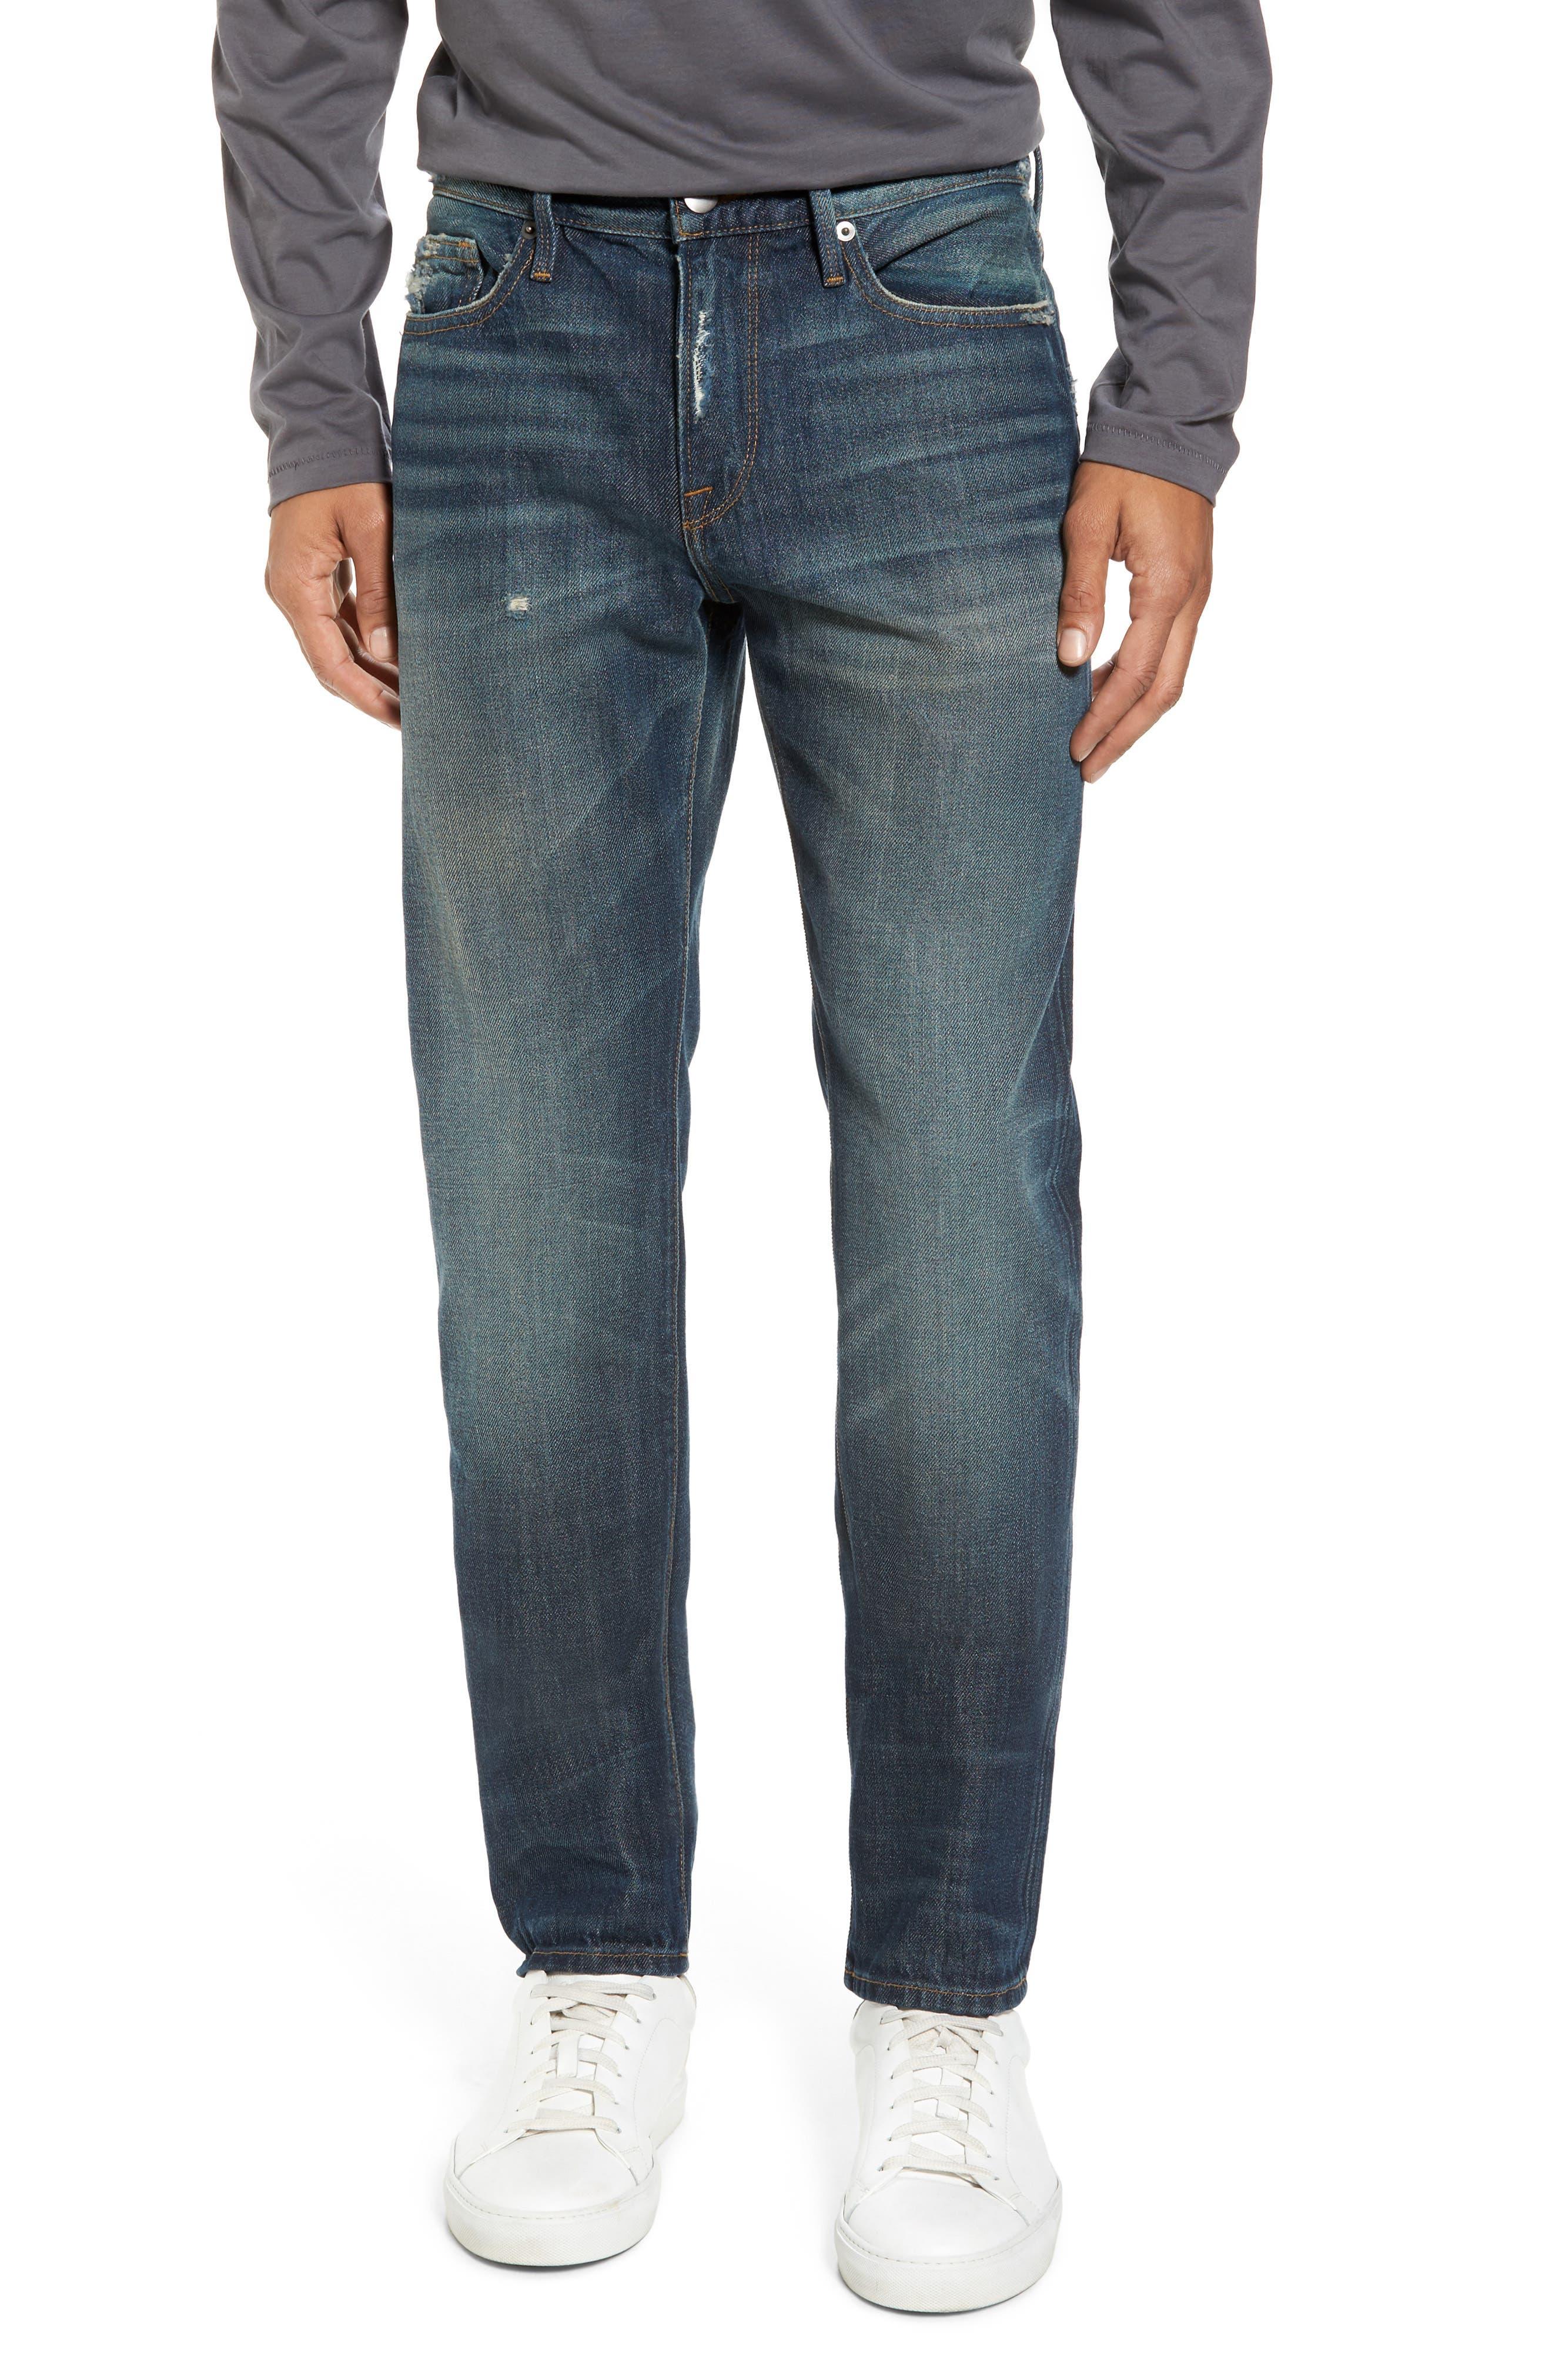 L'Homme Slim Fit Jeans,                         Main,                         color, Bunker